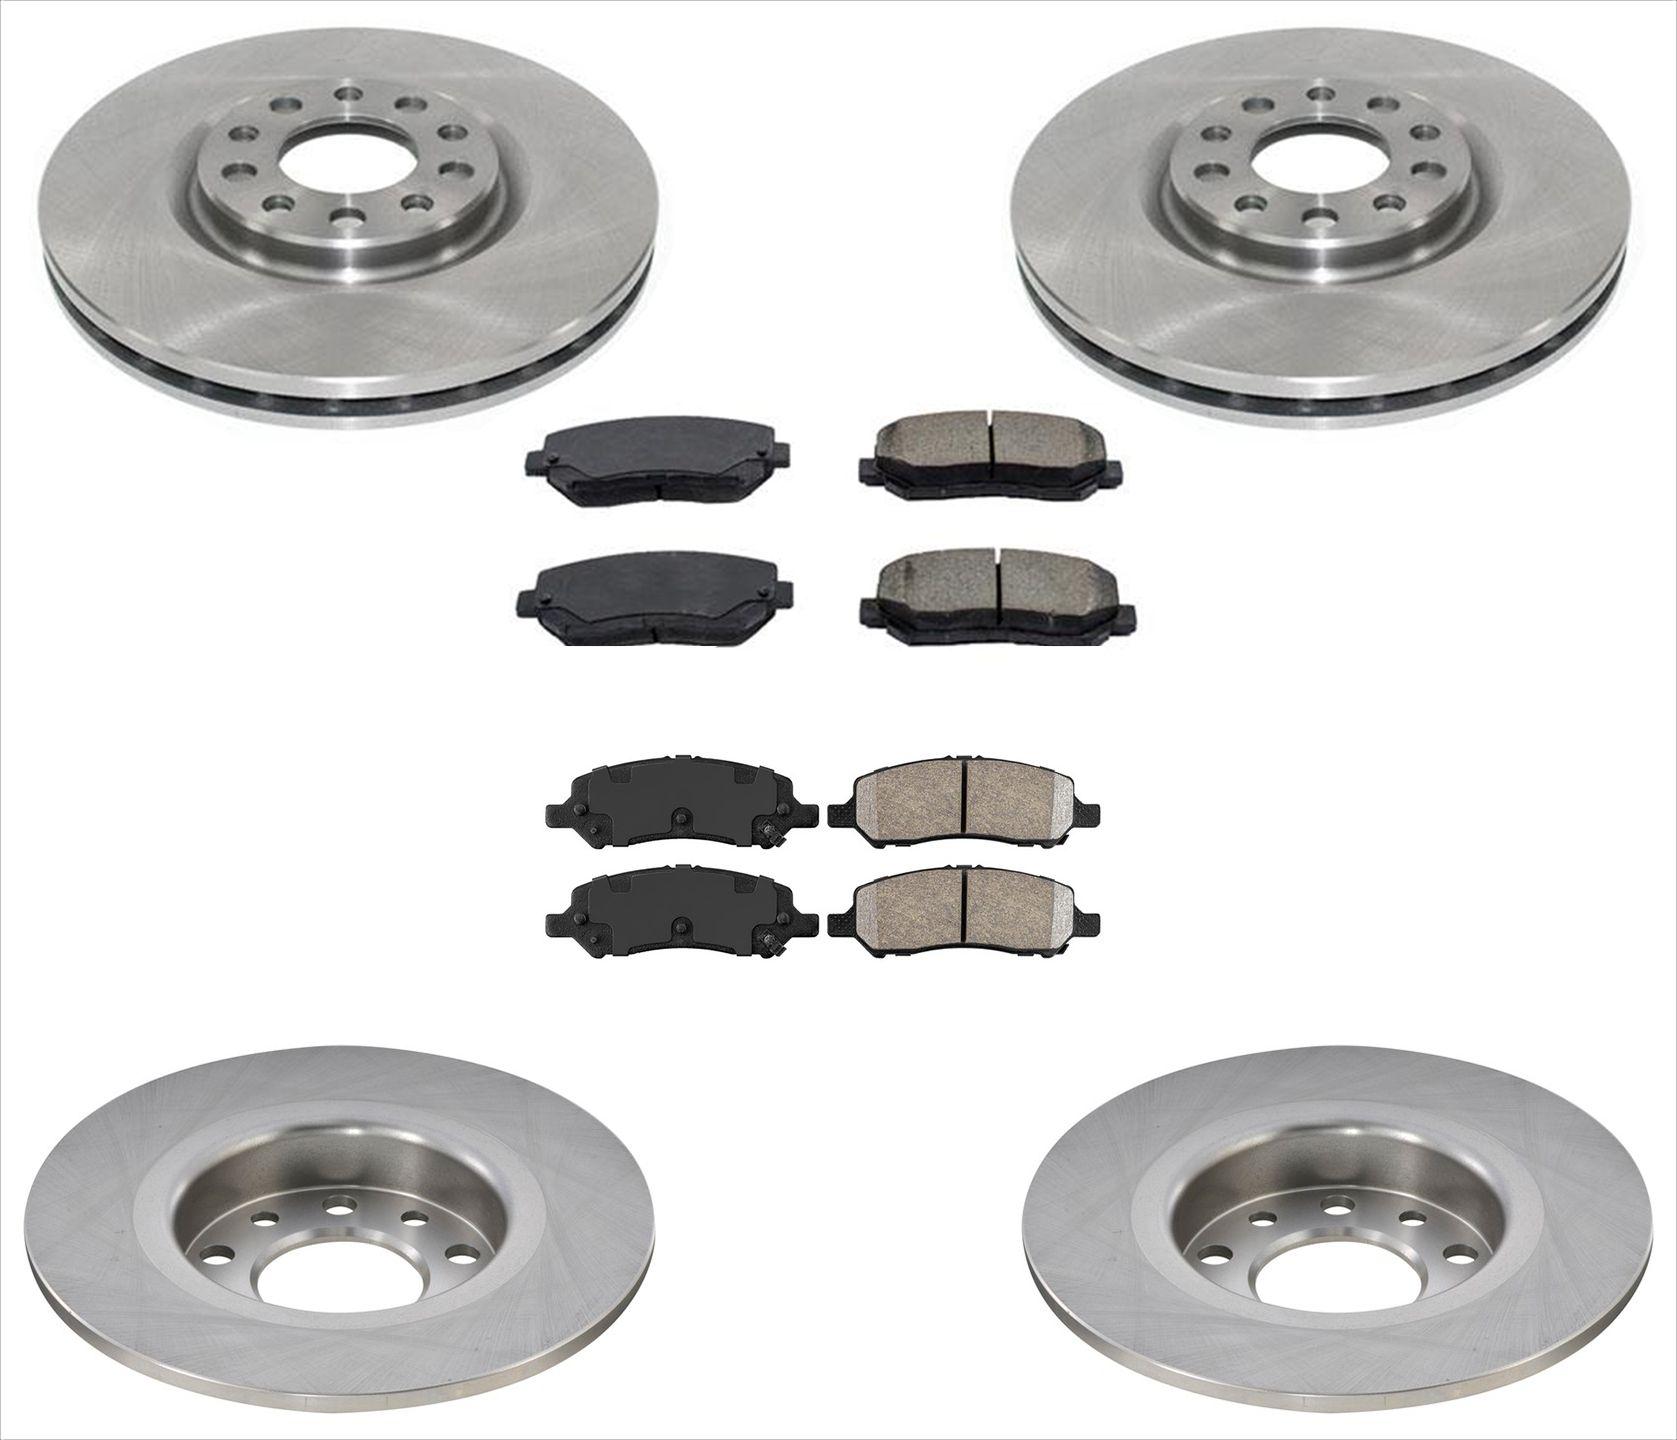 2 FRONT Brake Rotors /& Ceramic Pads 100/% All New for Mazda CX-9 07-15